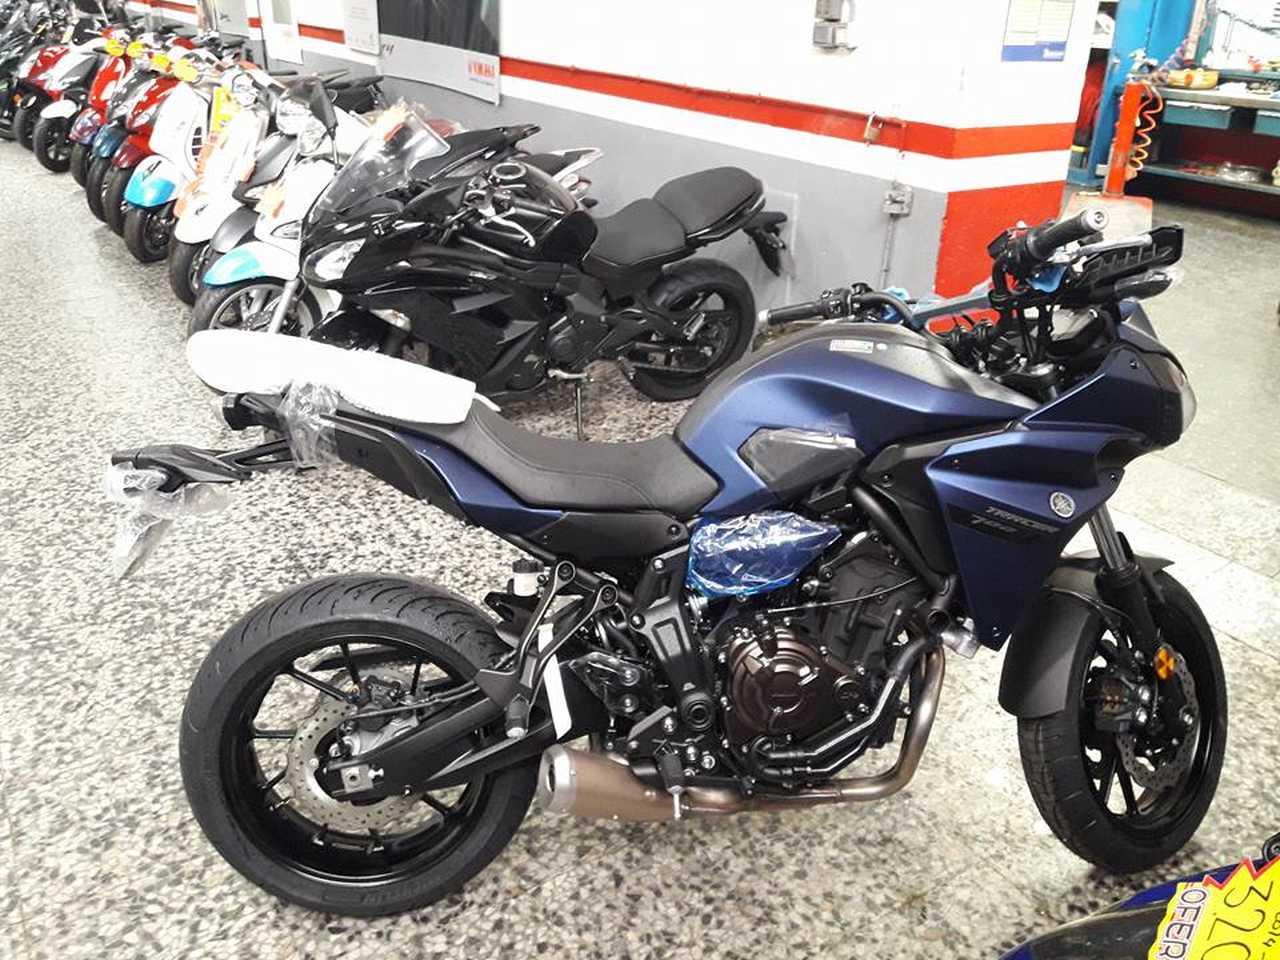 Yamaha MT-07 tracer 700  - Foto 1